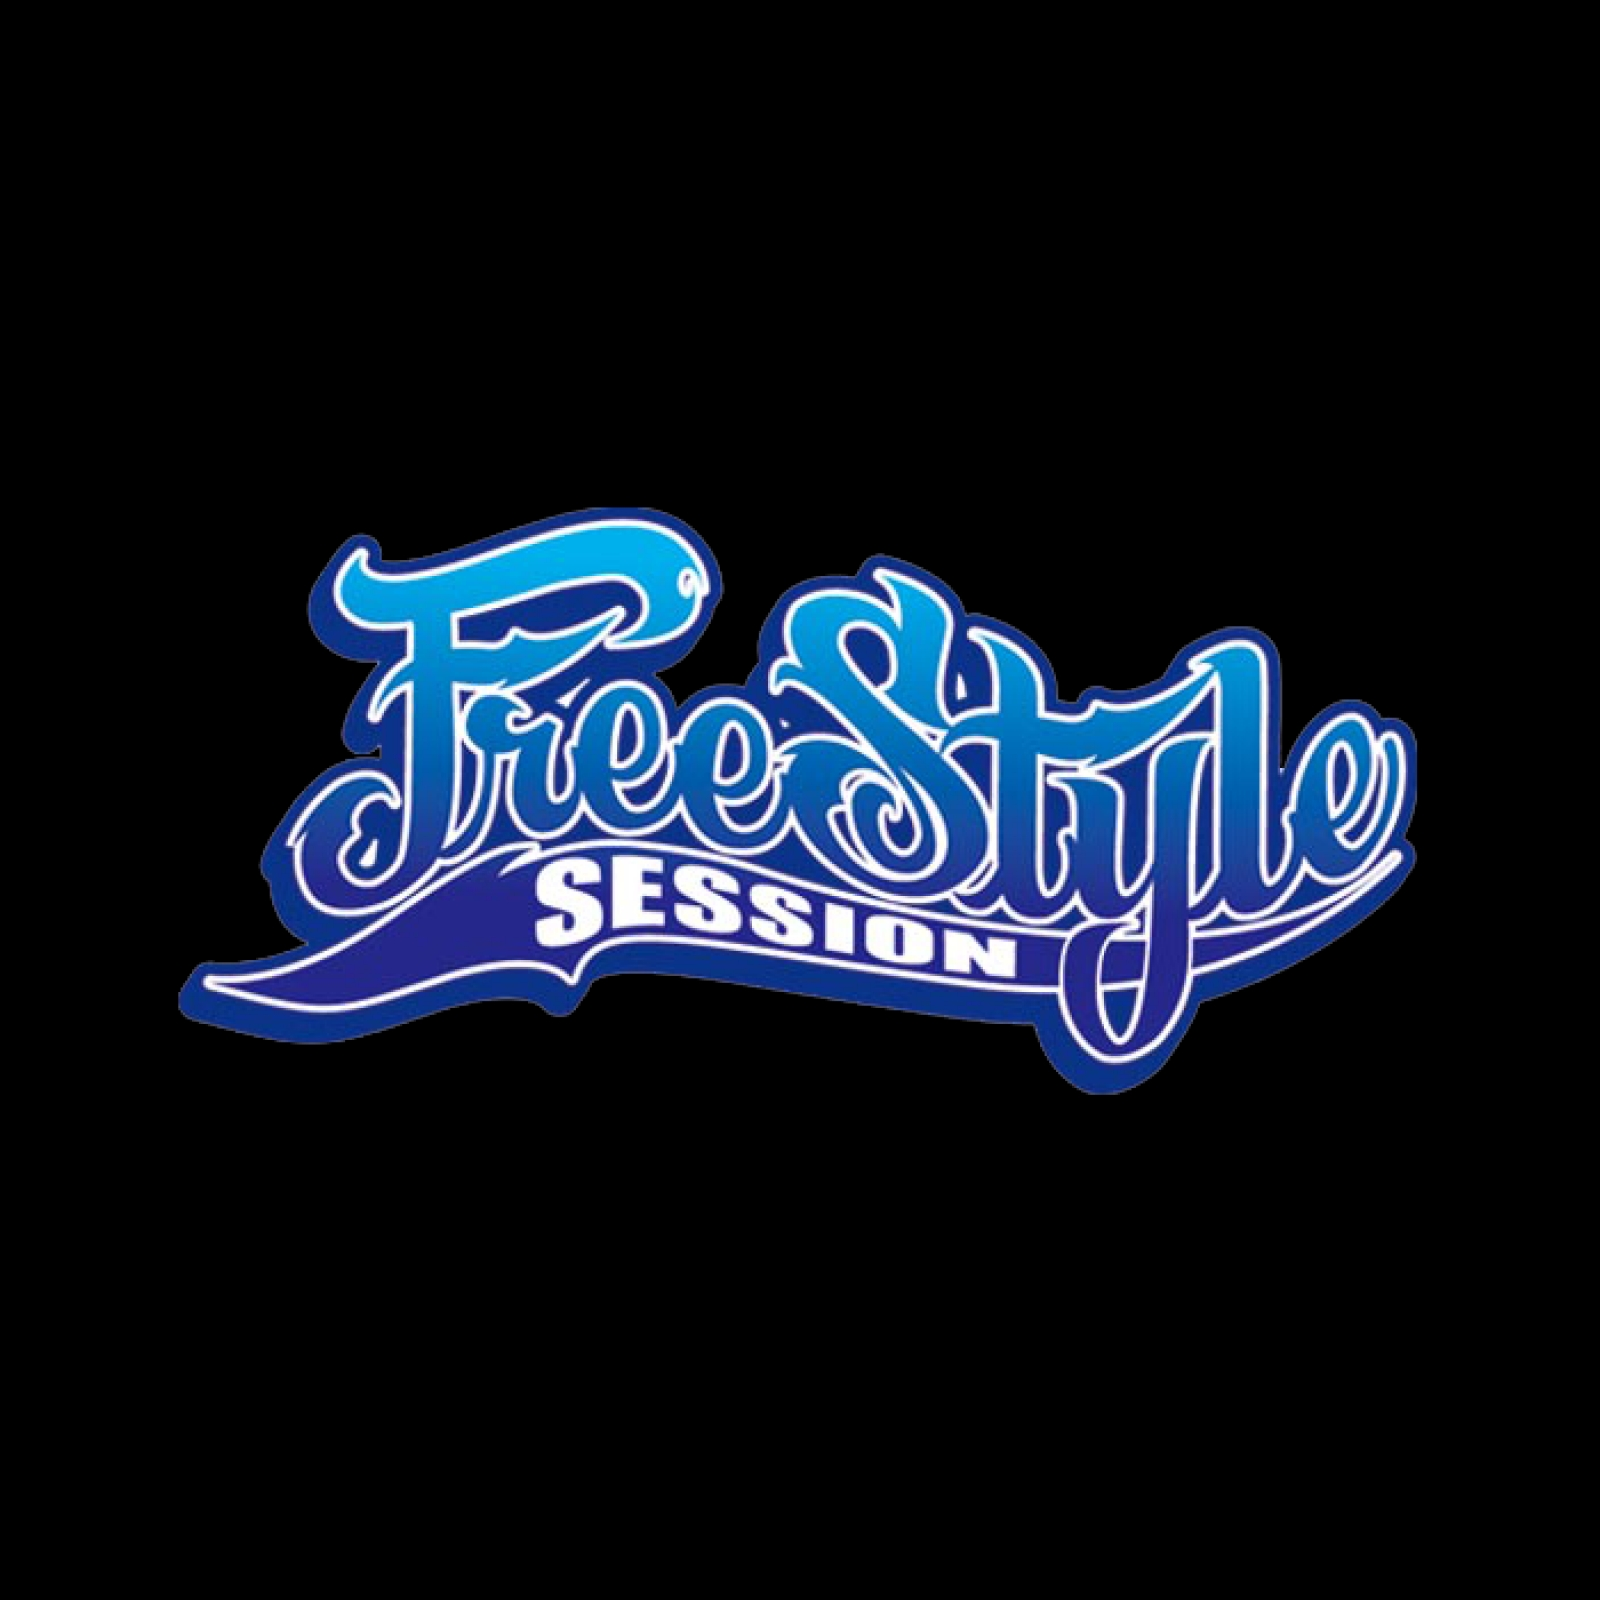 Freestyle Session at BboyEvent.com